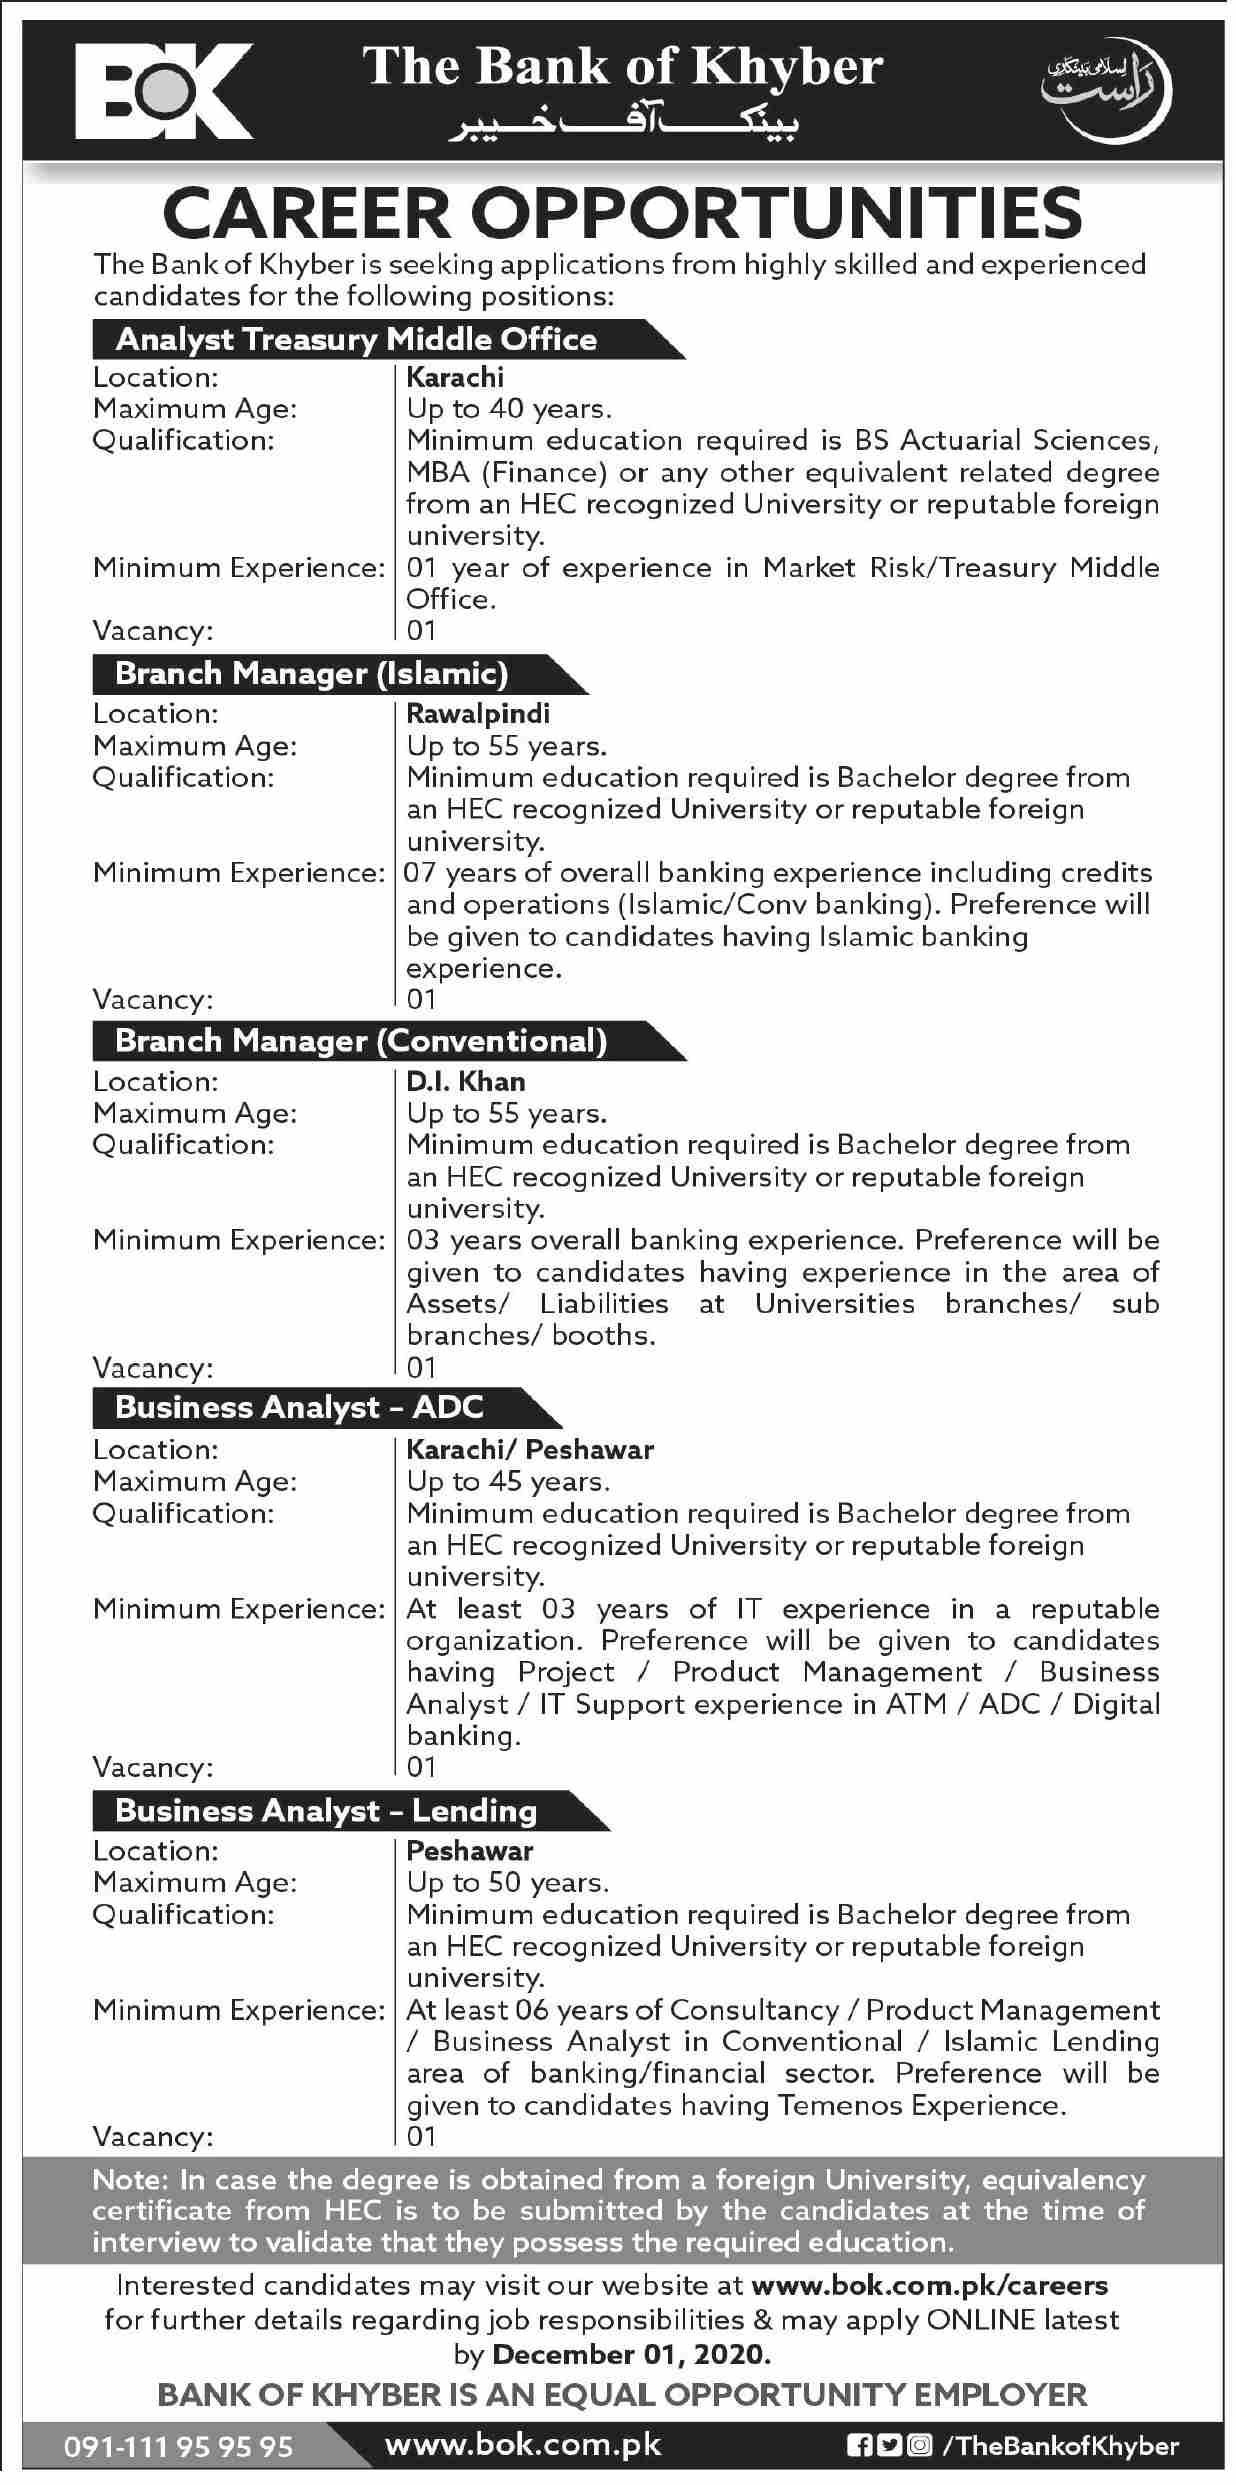 Bank of Khyber BOK Latest Nov 2020 Jobs in Pakistan 2020 - Online Apply - www.bok.com.pk/careers/